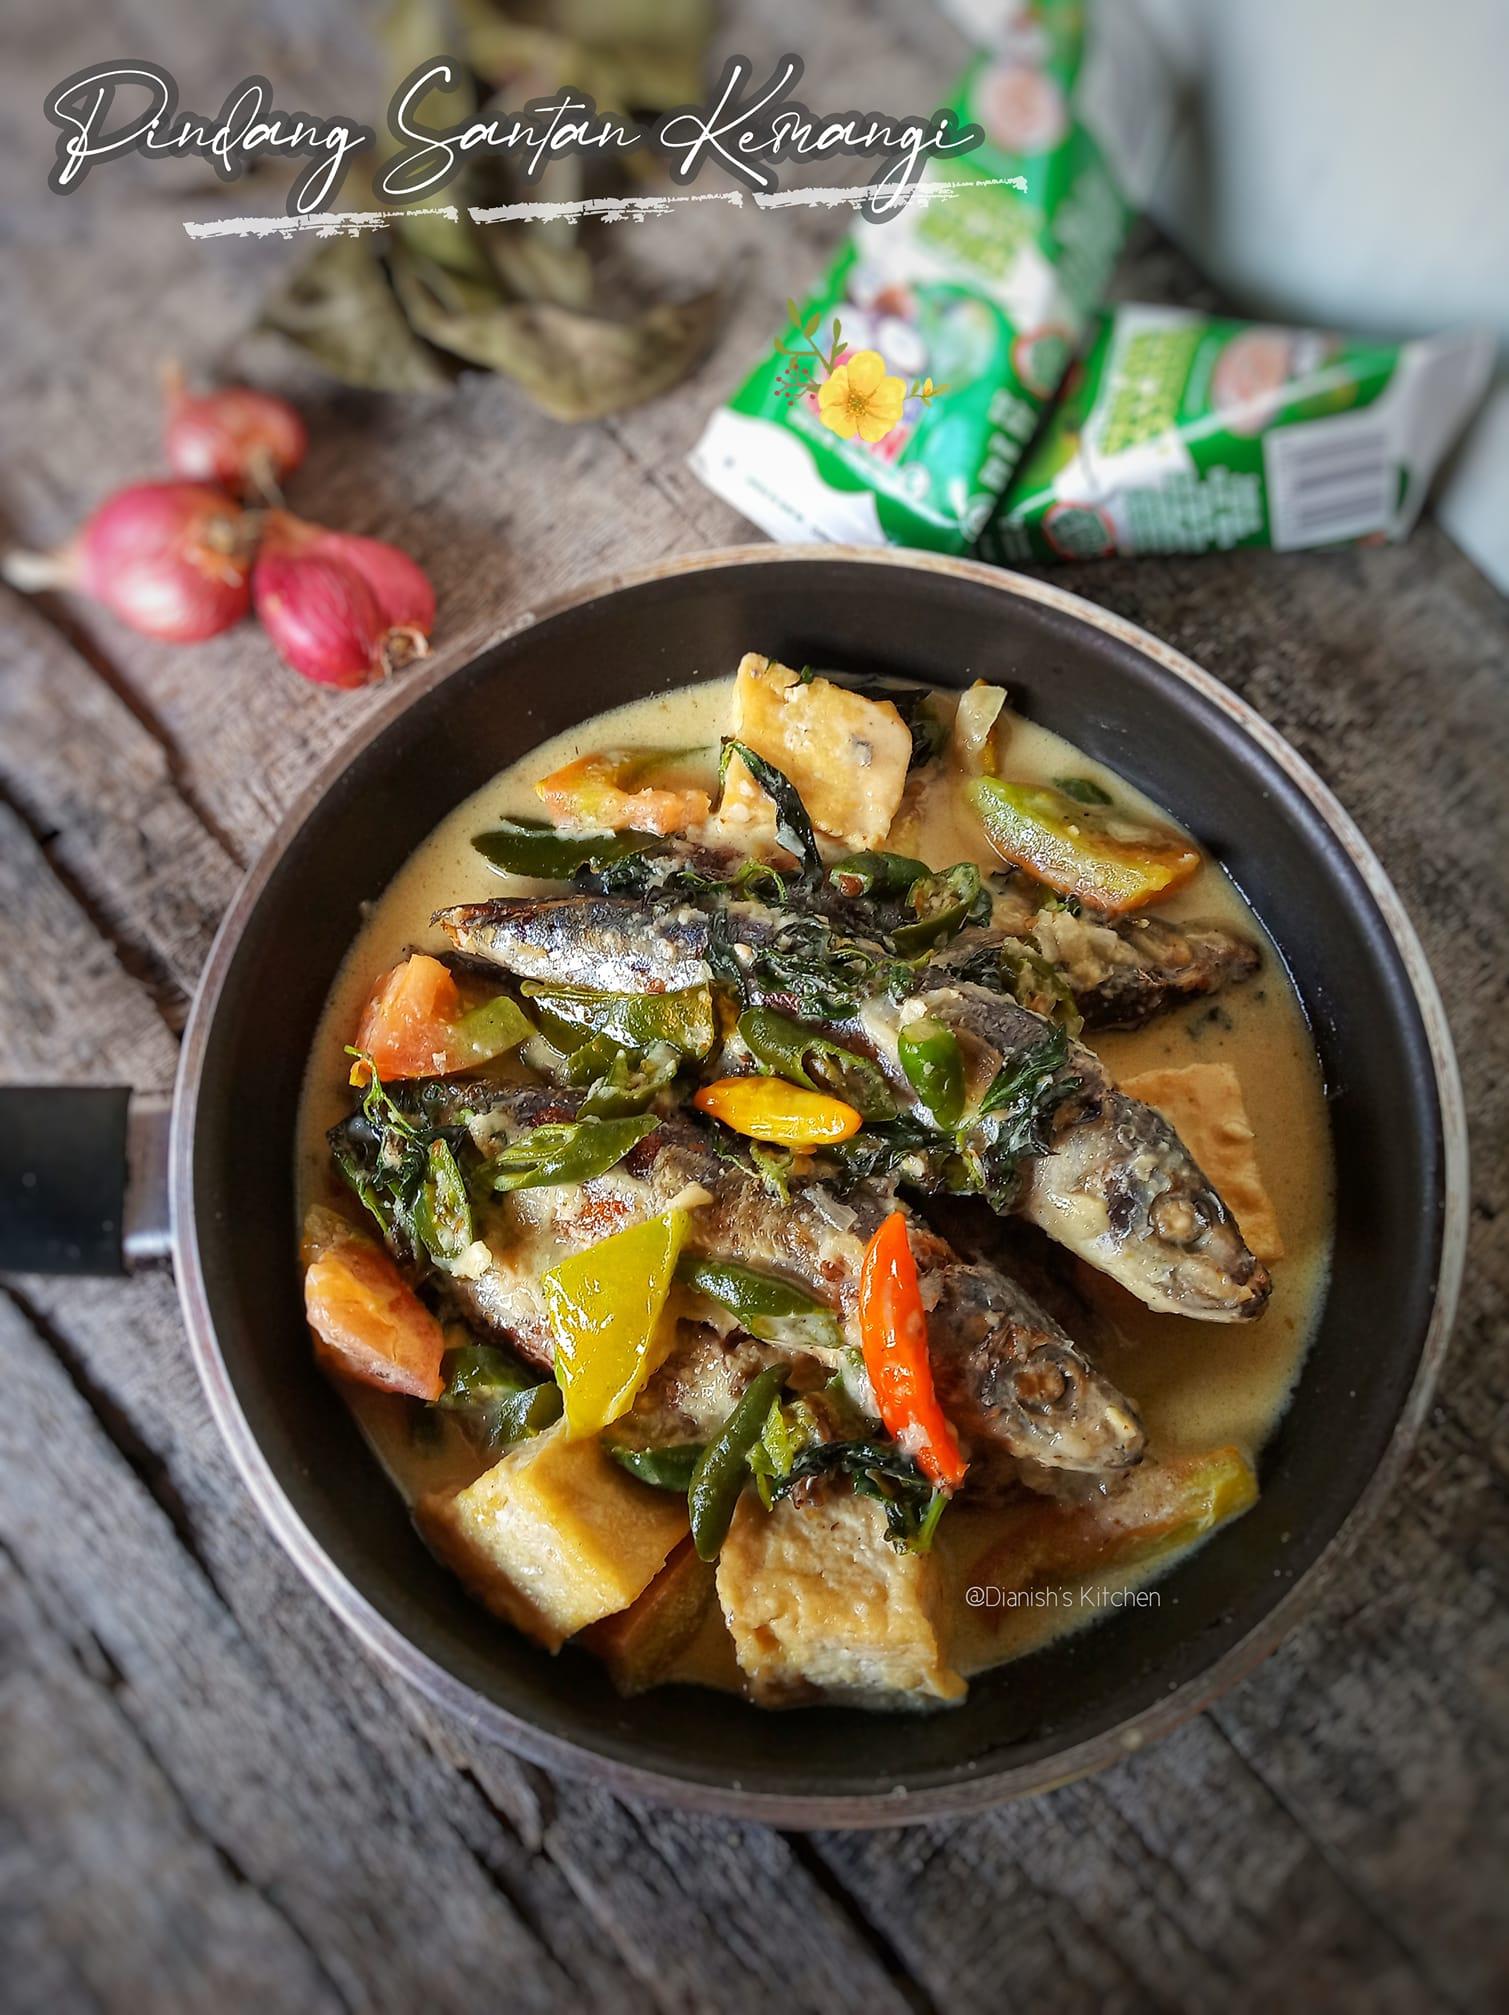 PINDANG SANTAN KEMANGI by Dianish's Kitchen